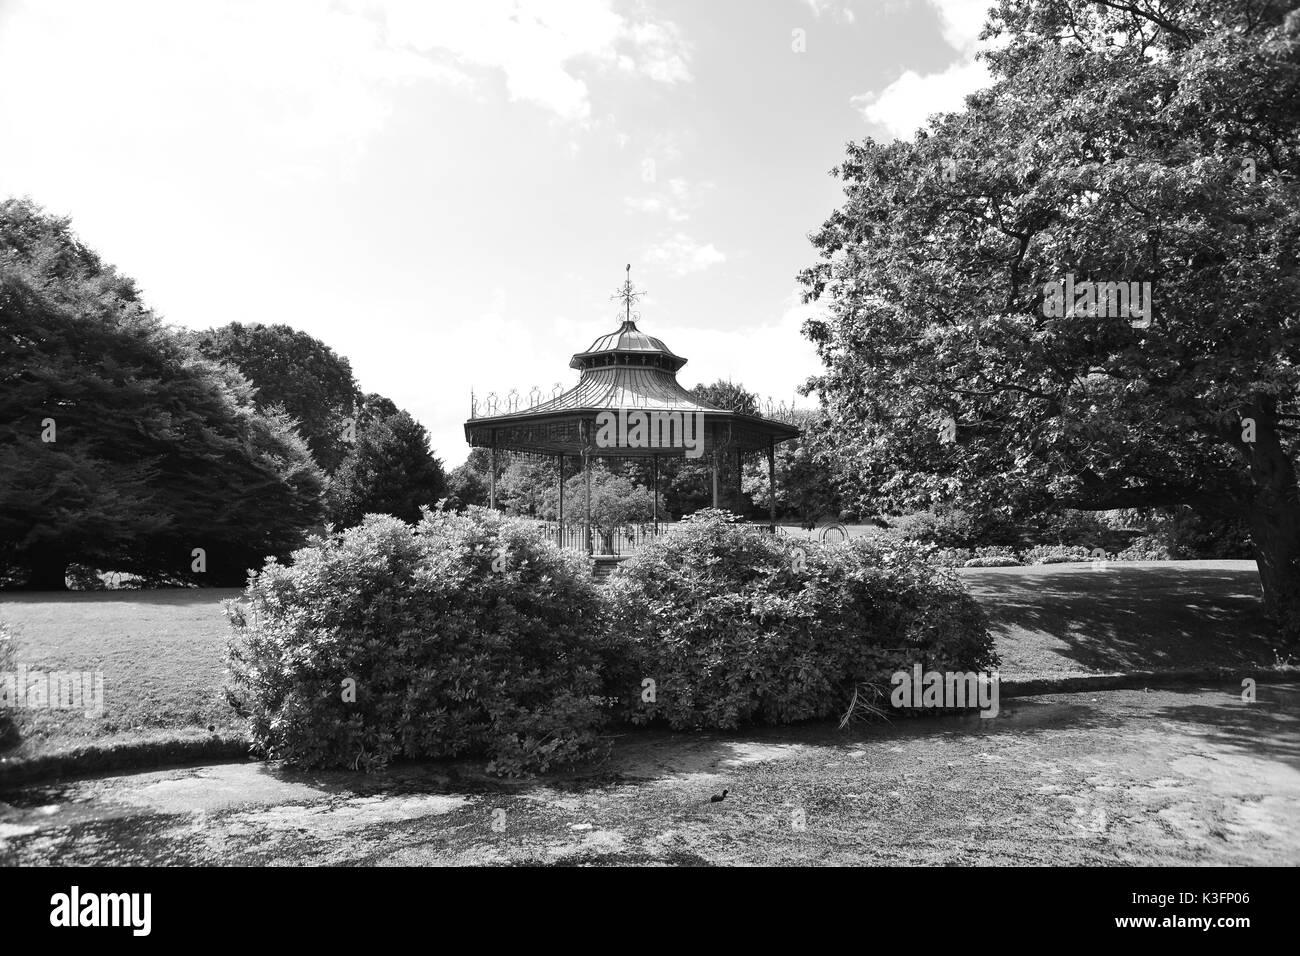 Sefton Park - Stock Image